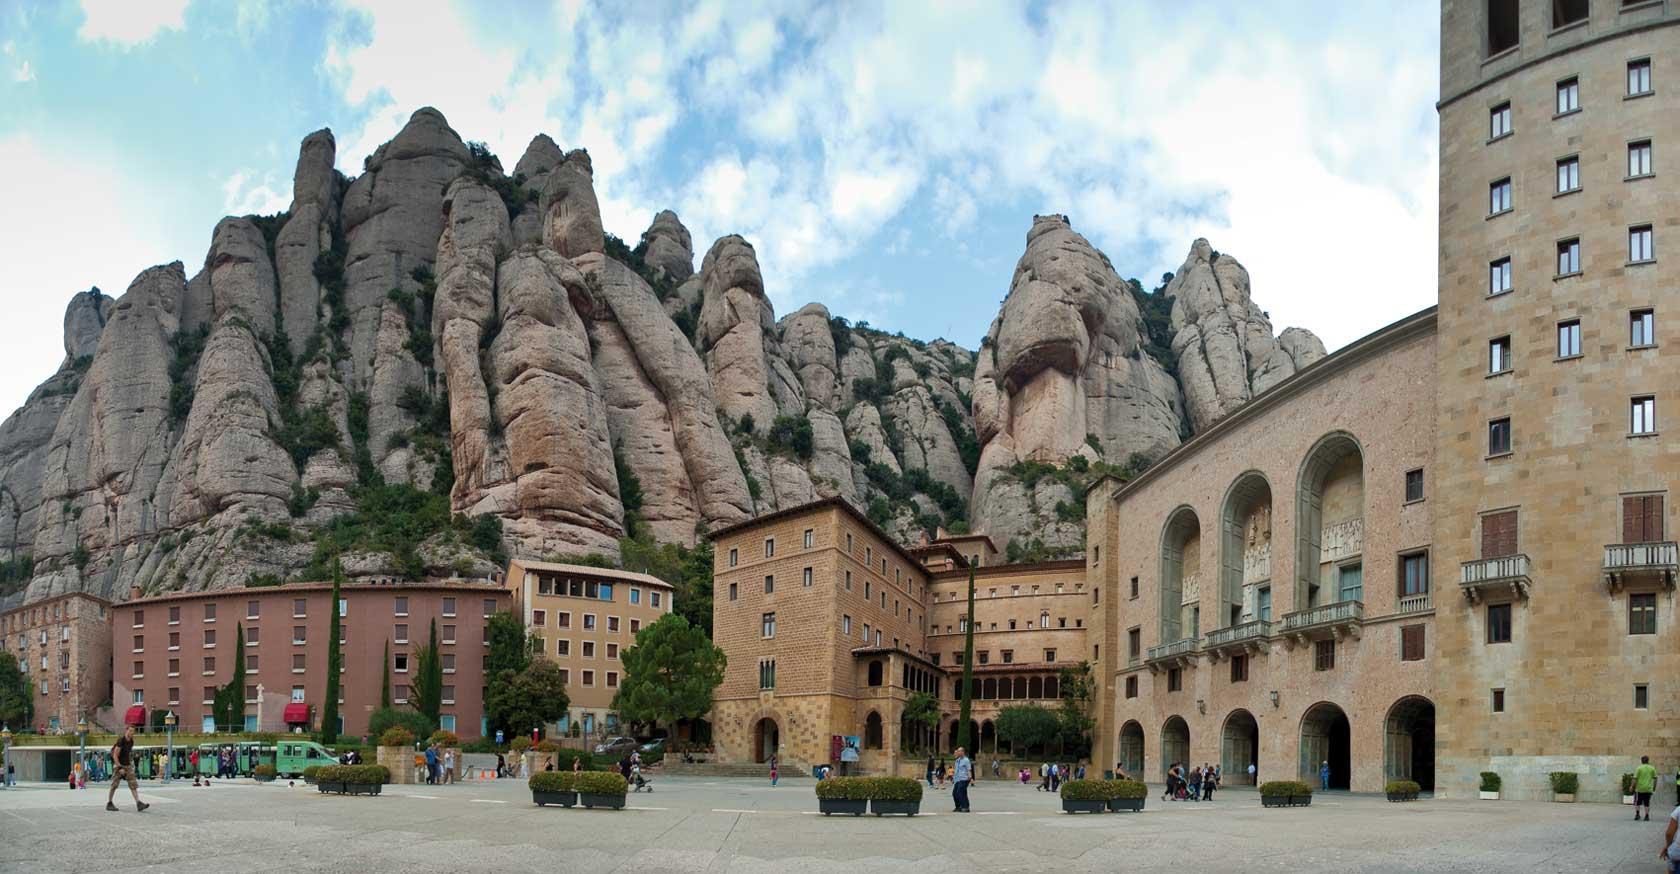 LLIBRE-VERMELL_02_Montserrat-monasterio-de_Foto_Alex-Williams